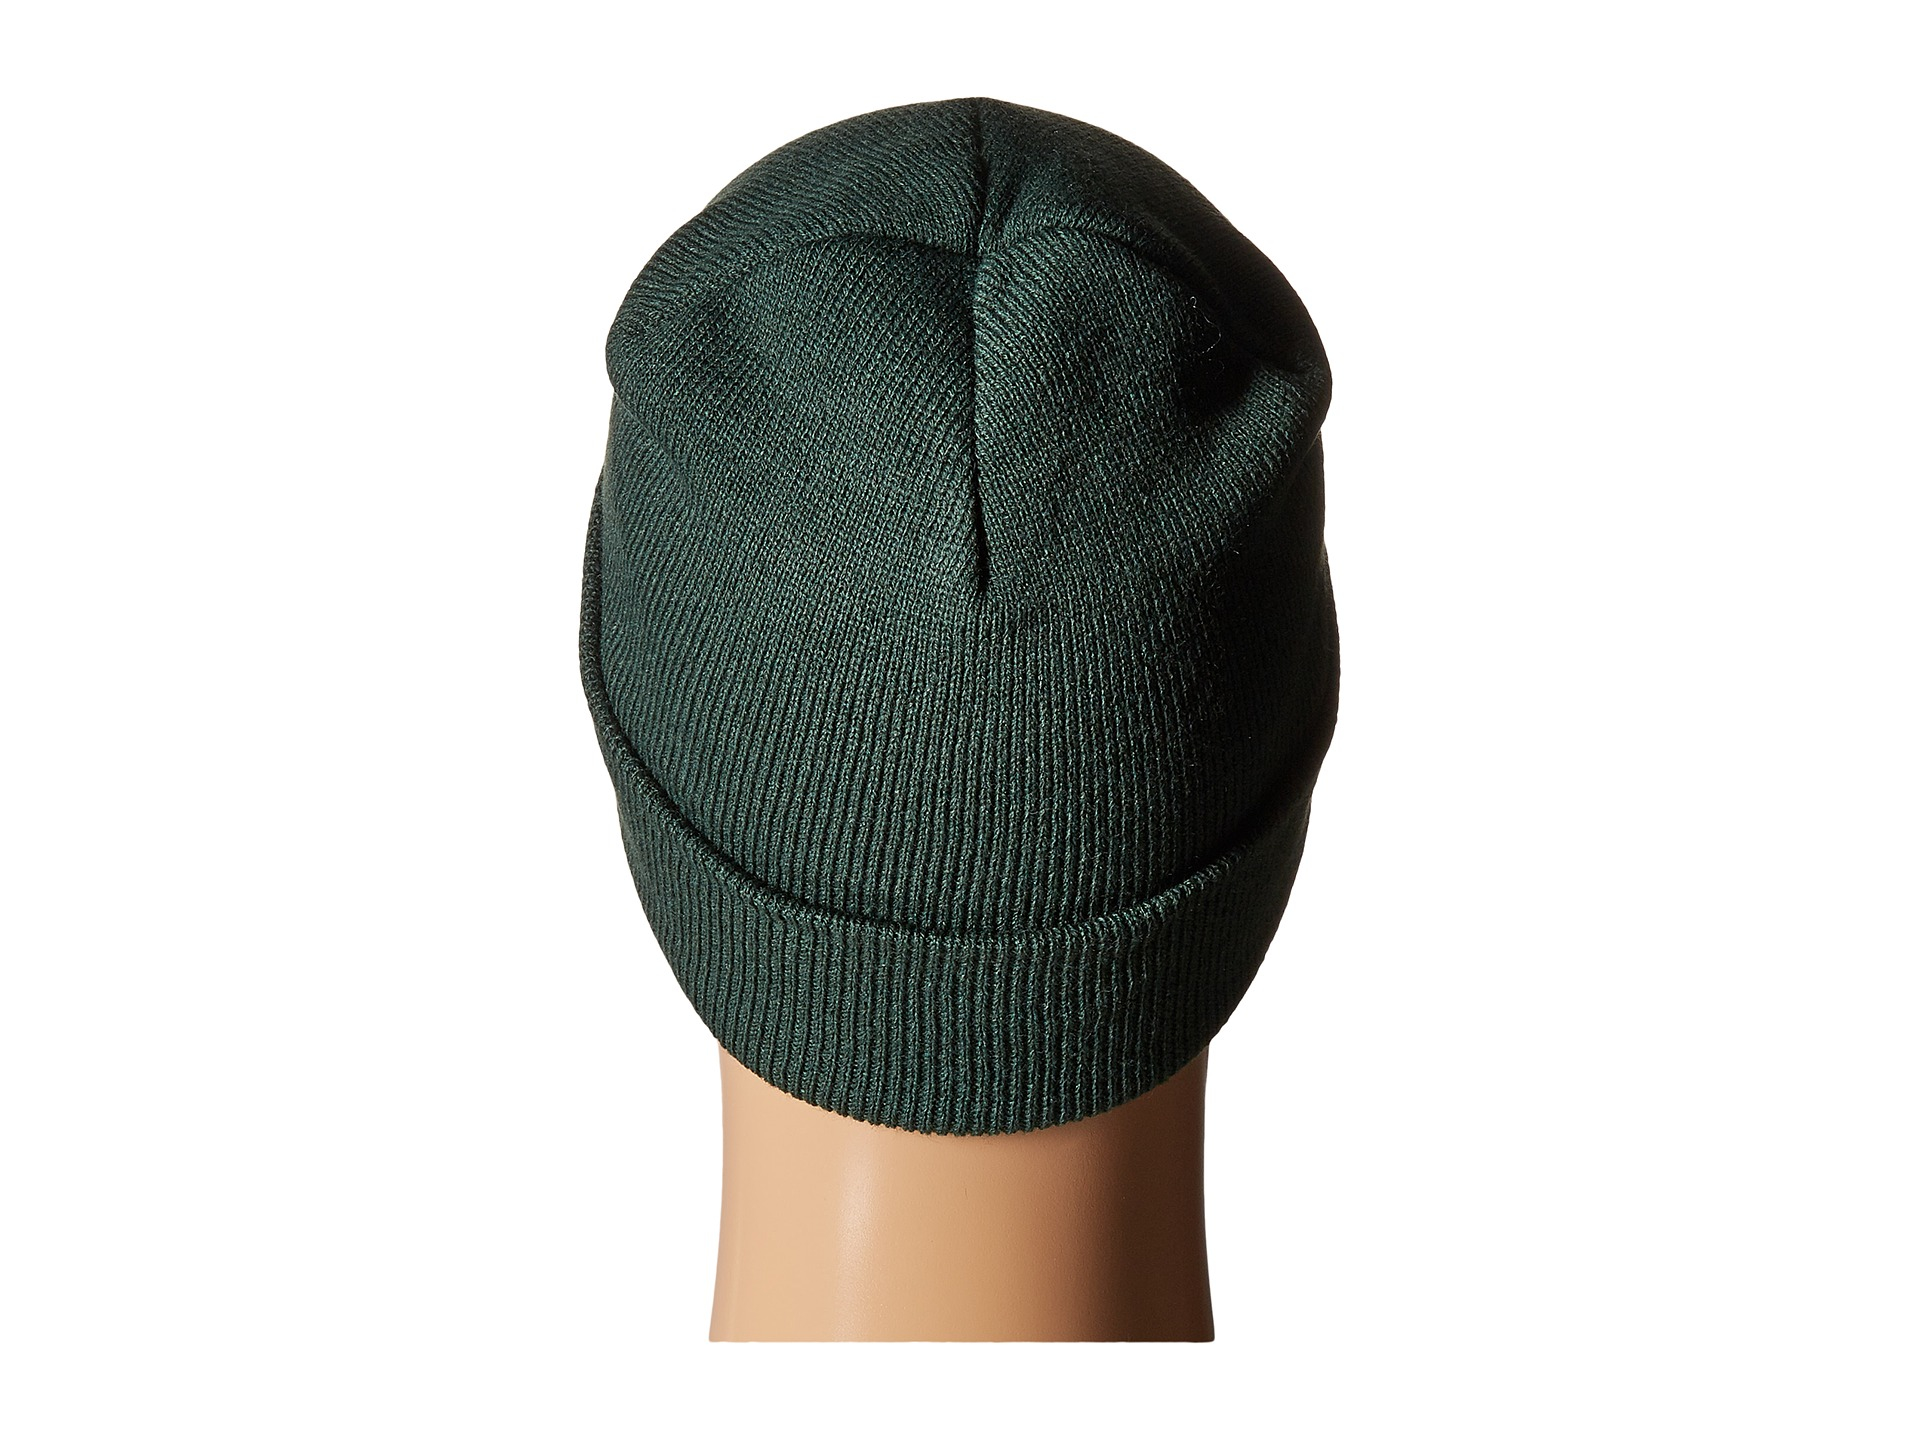 c599b9eafaa Lyst - Huf Box Logo Beanie in Green for Men